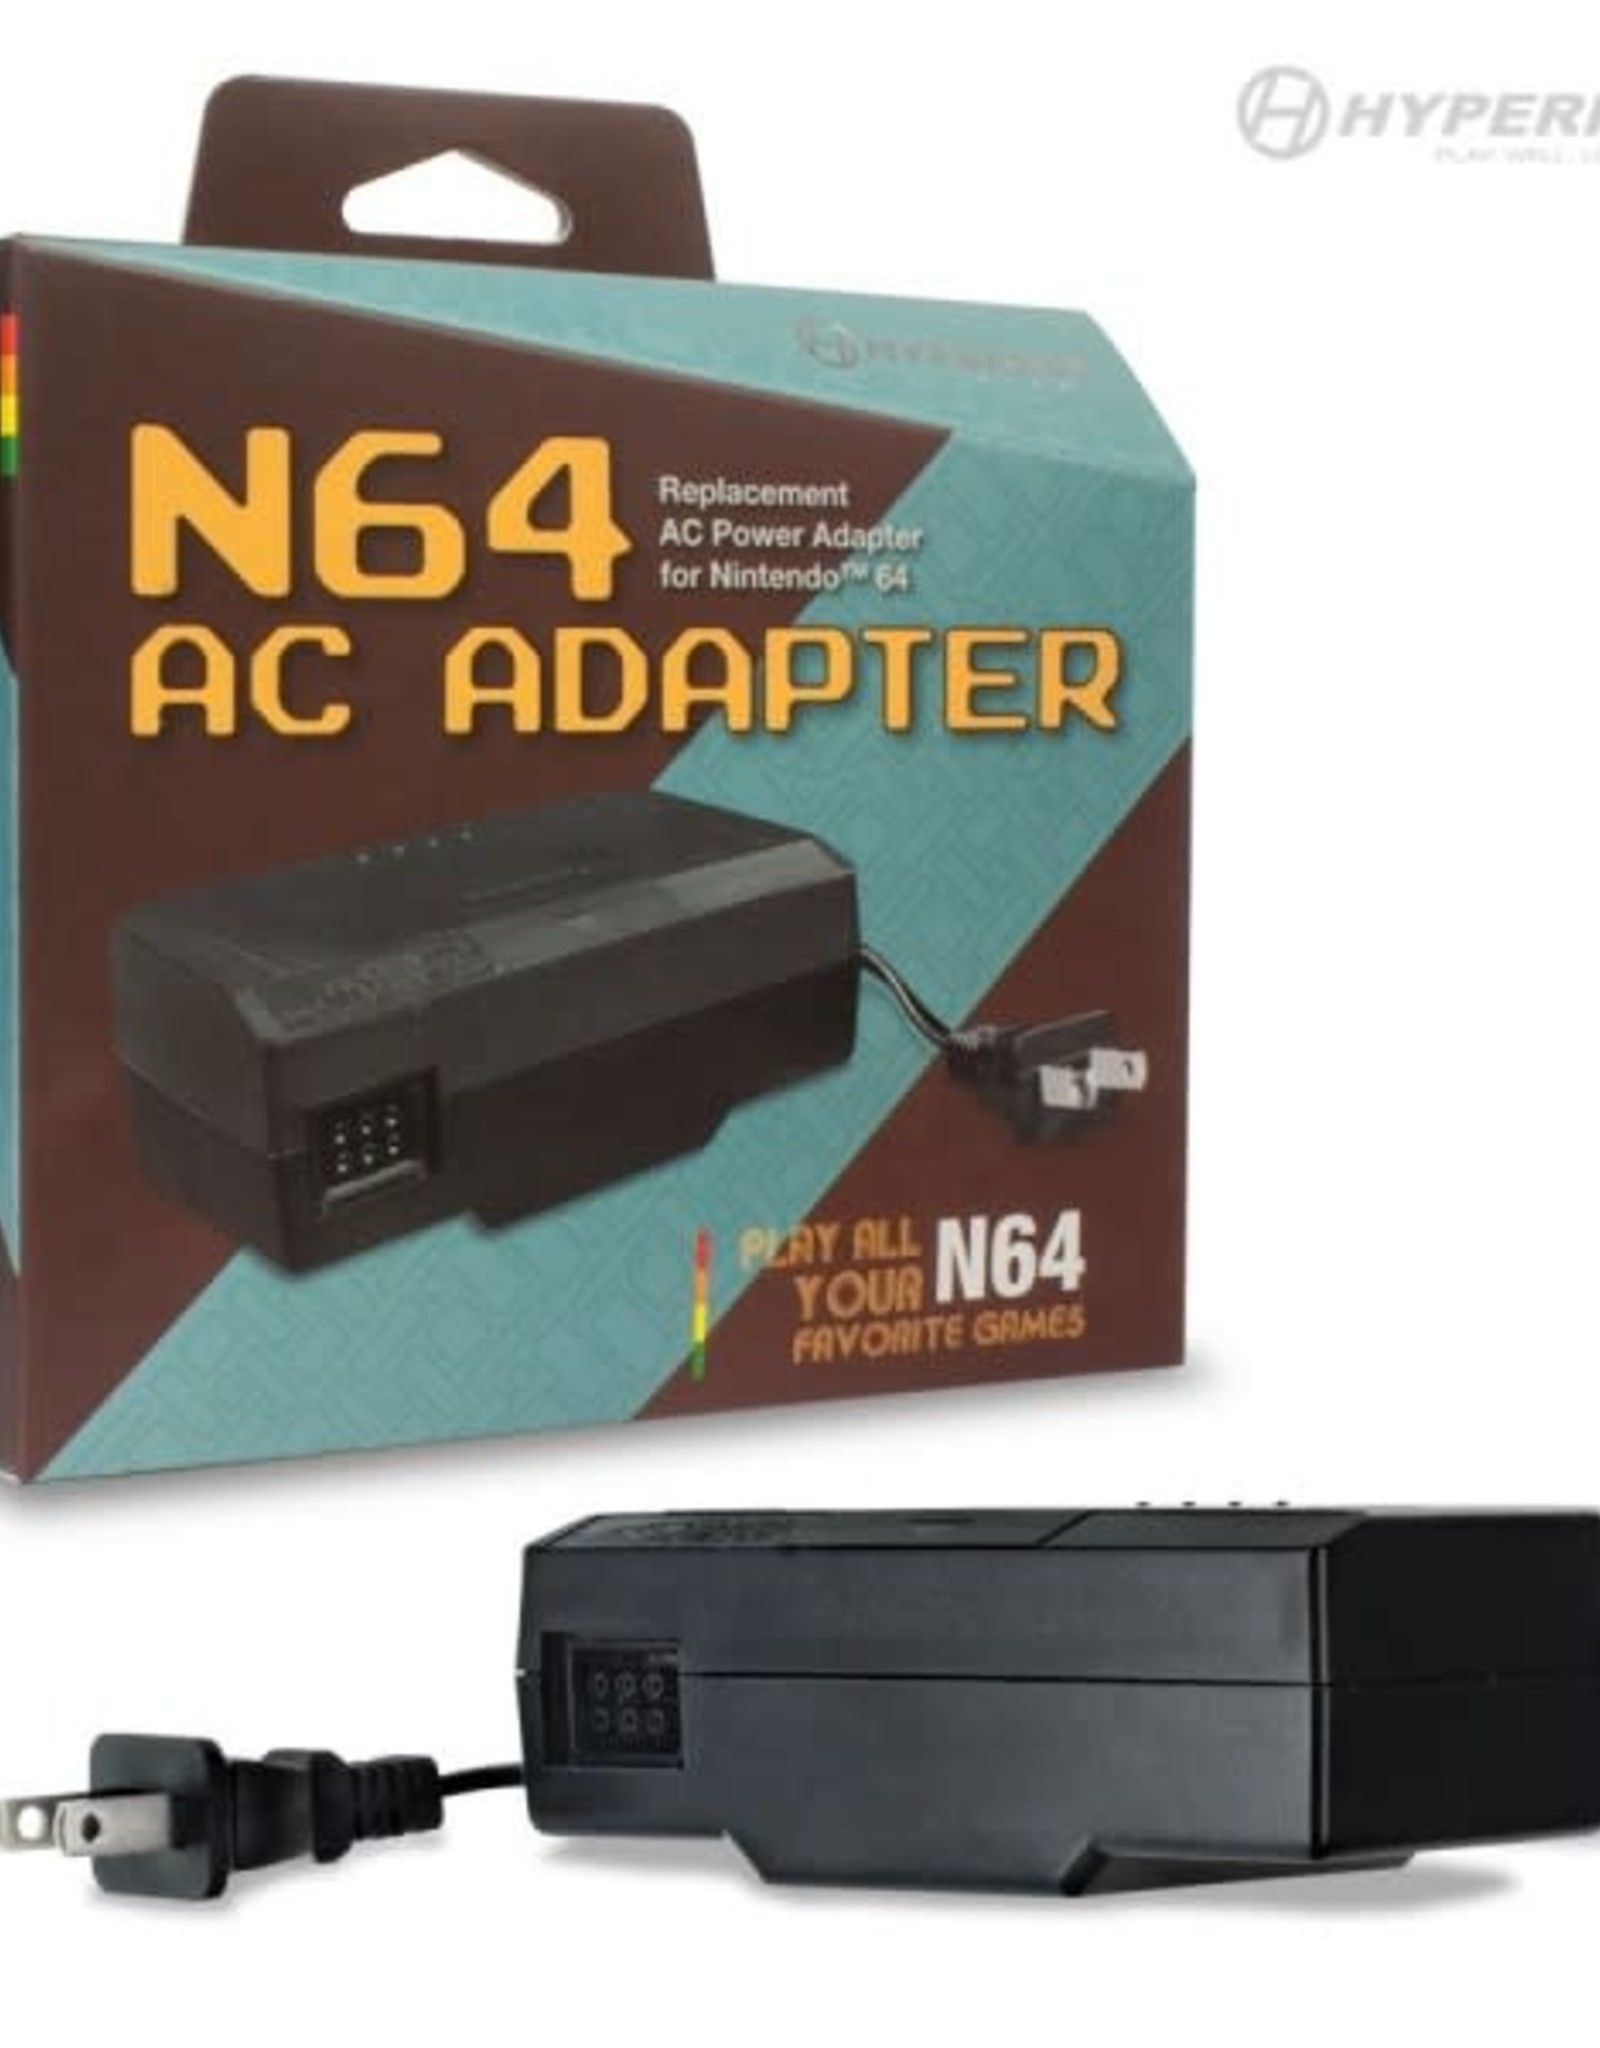 Hyperkin AC Adapter For N64®